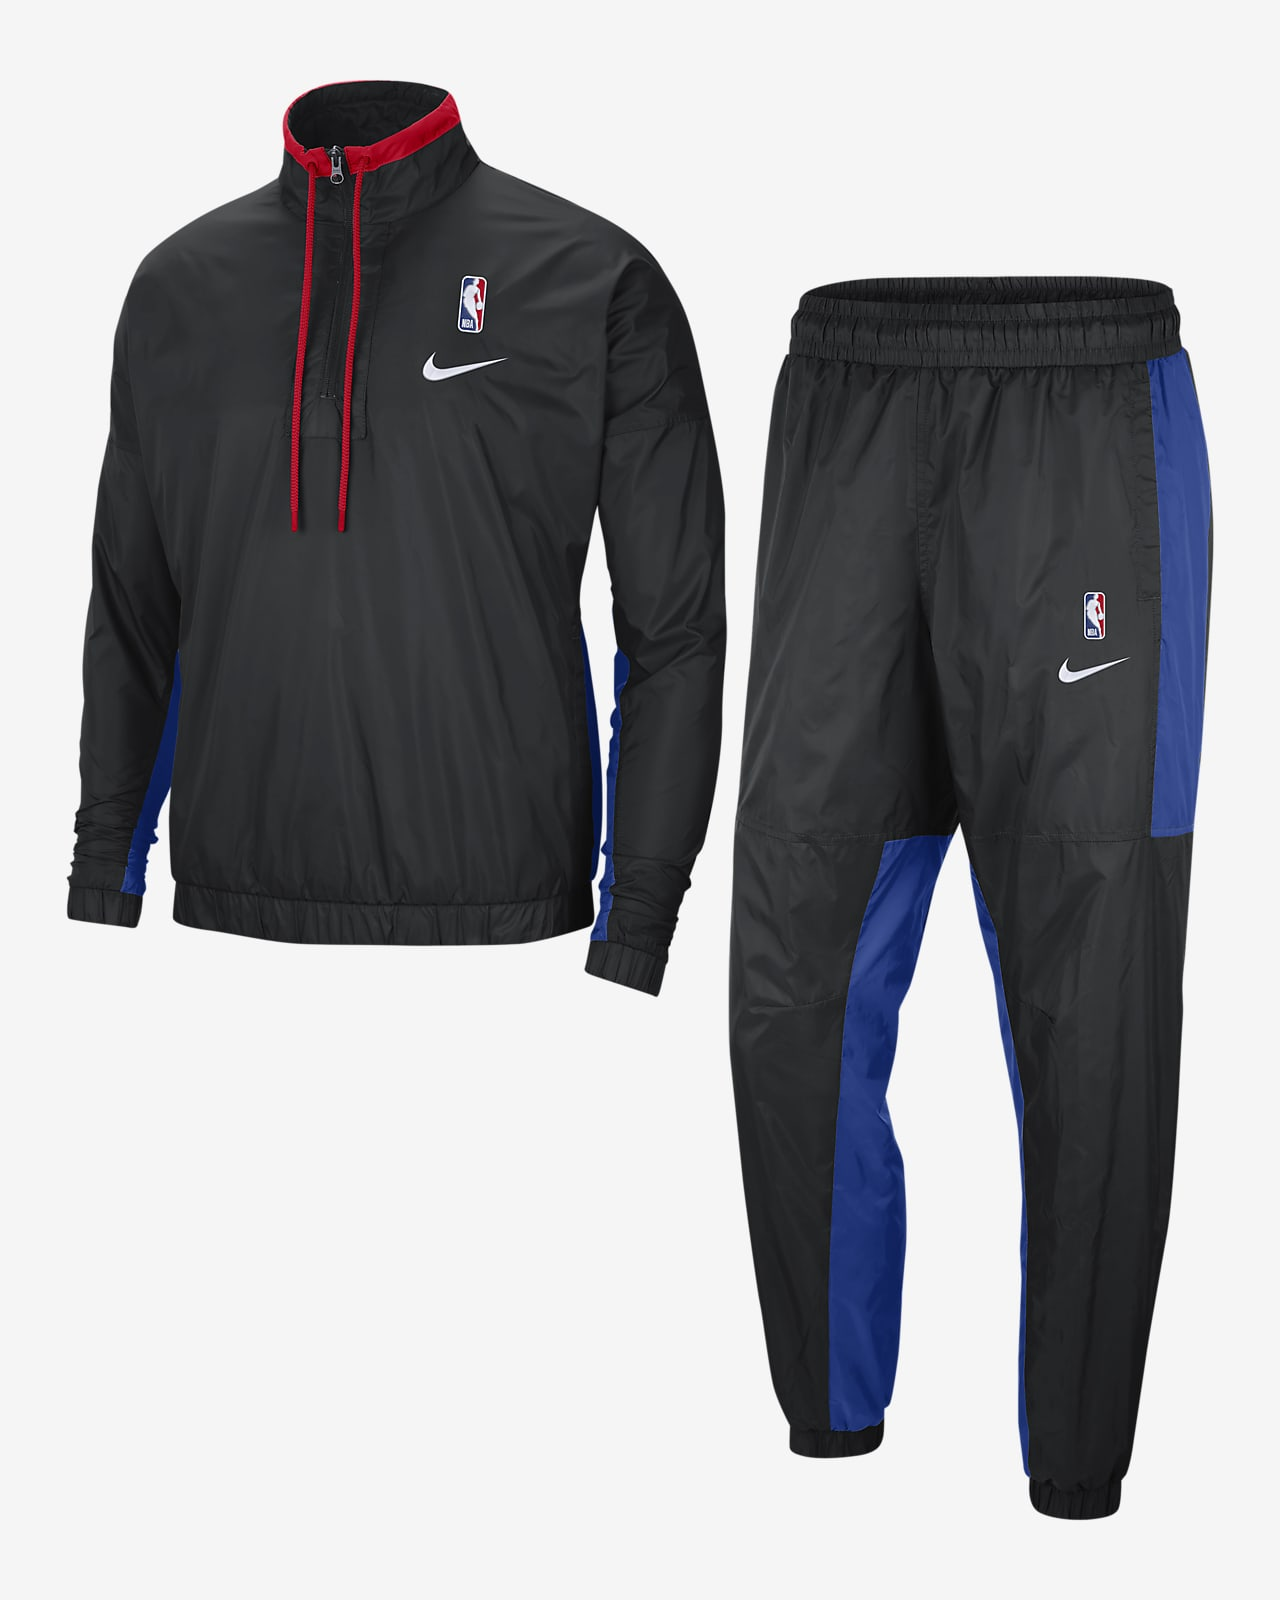 Team 31 Courtside Men's Nike NBA Tracksuit